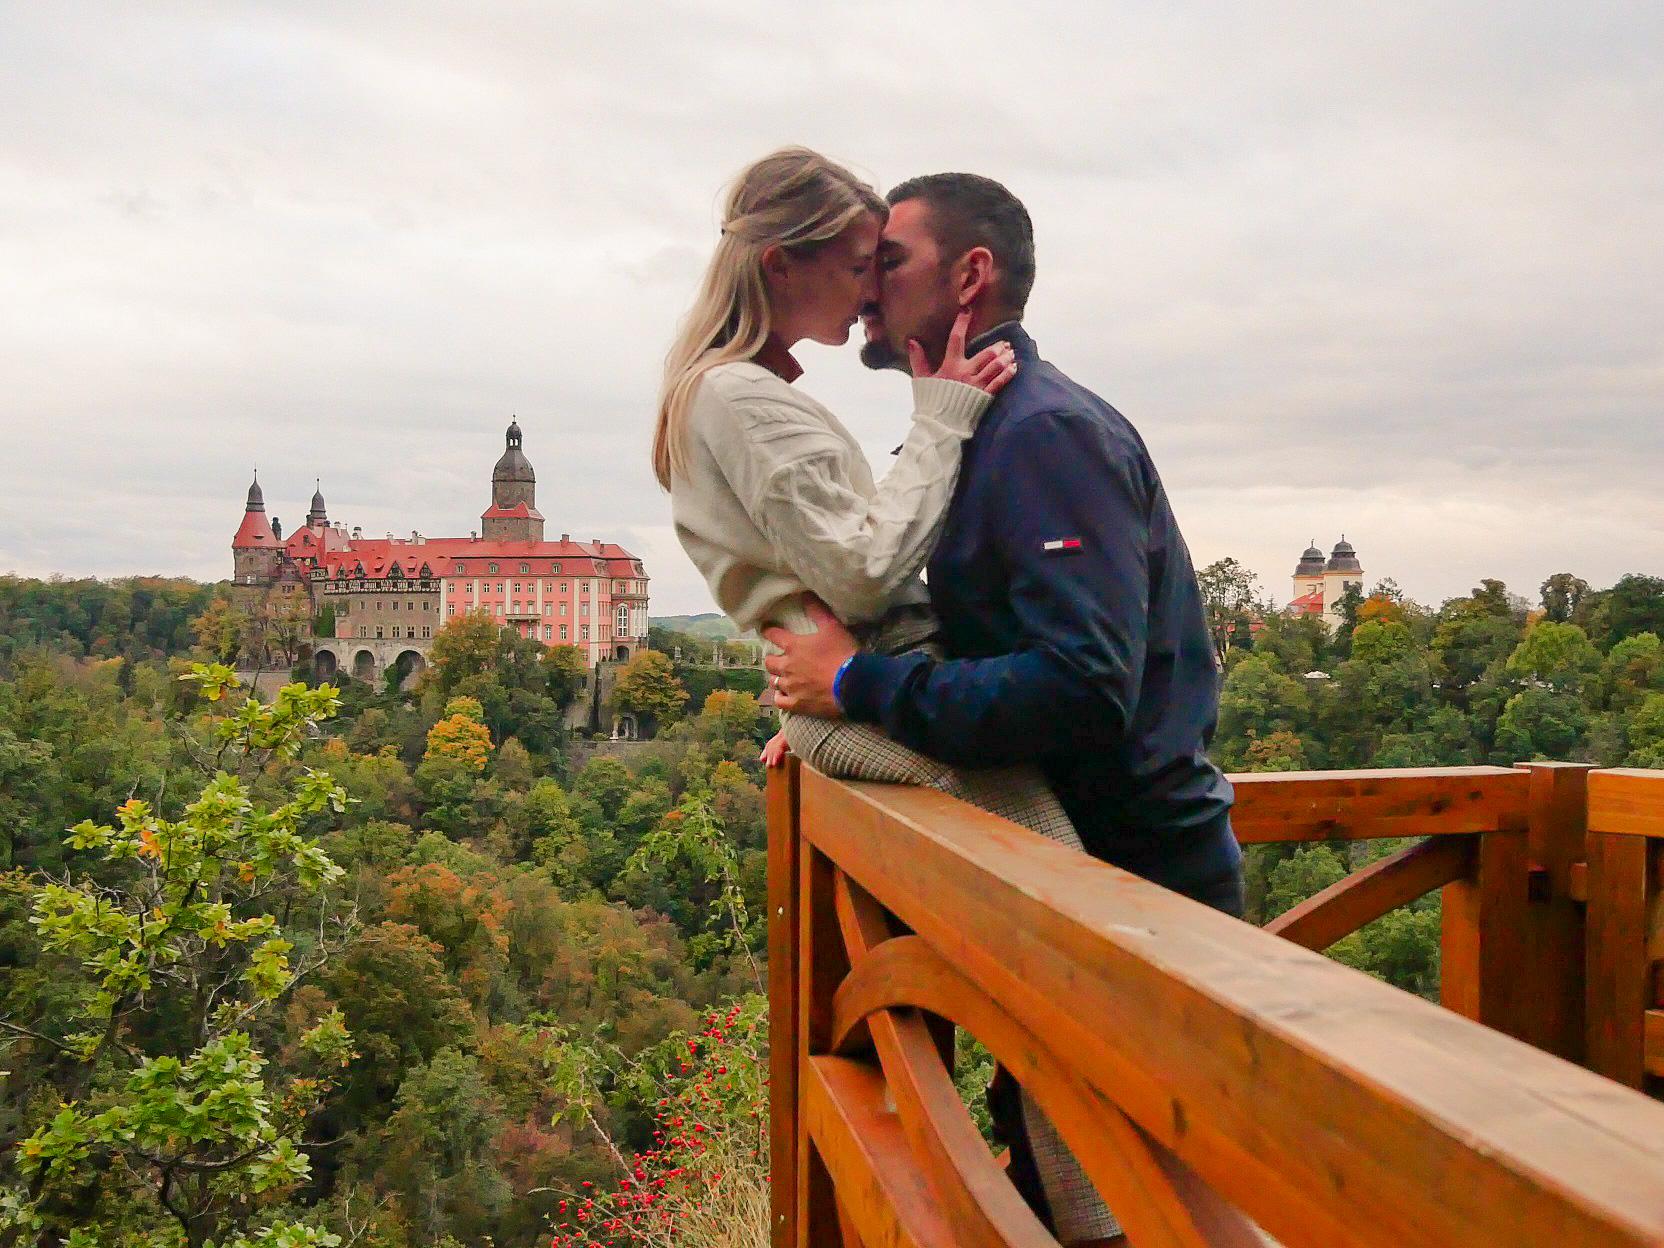 Zámok Ksiaz a mestá Swidnica a Jawor - skryté klenoty Poľska